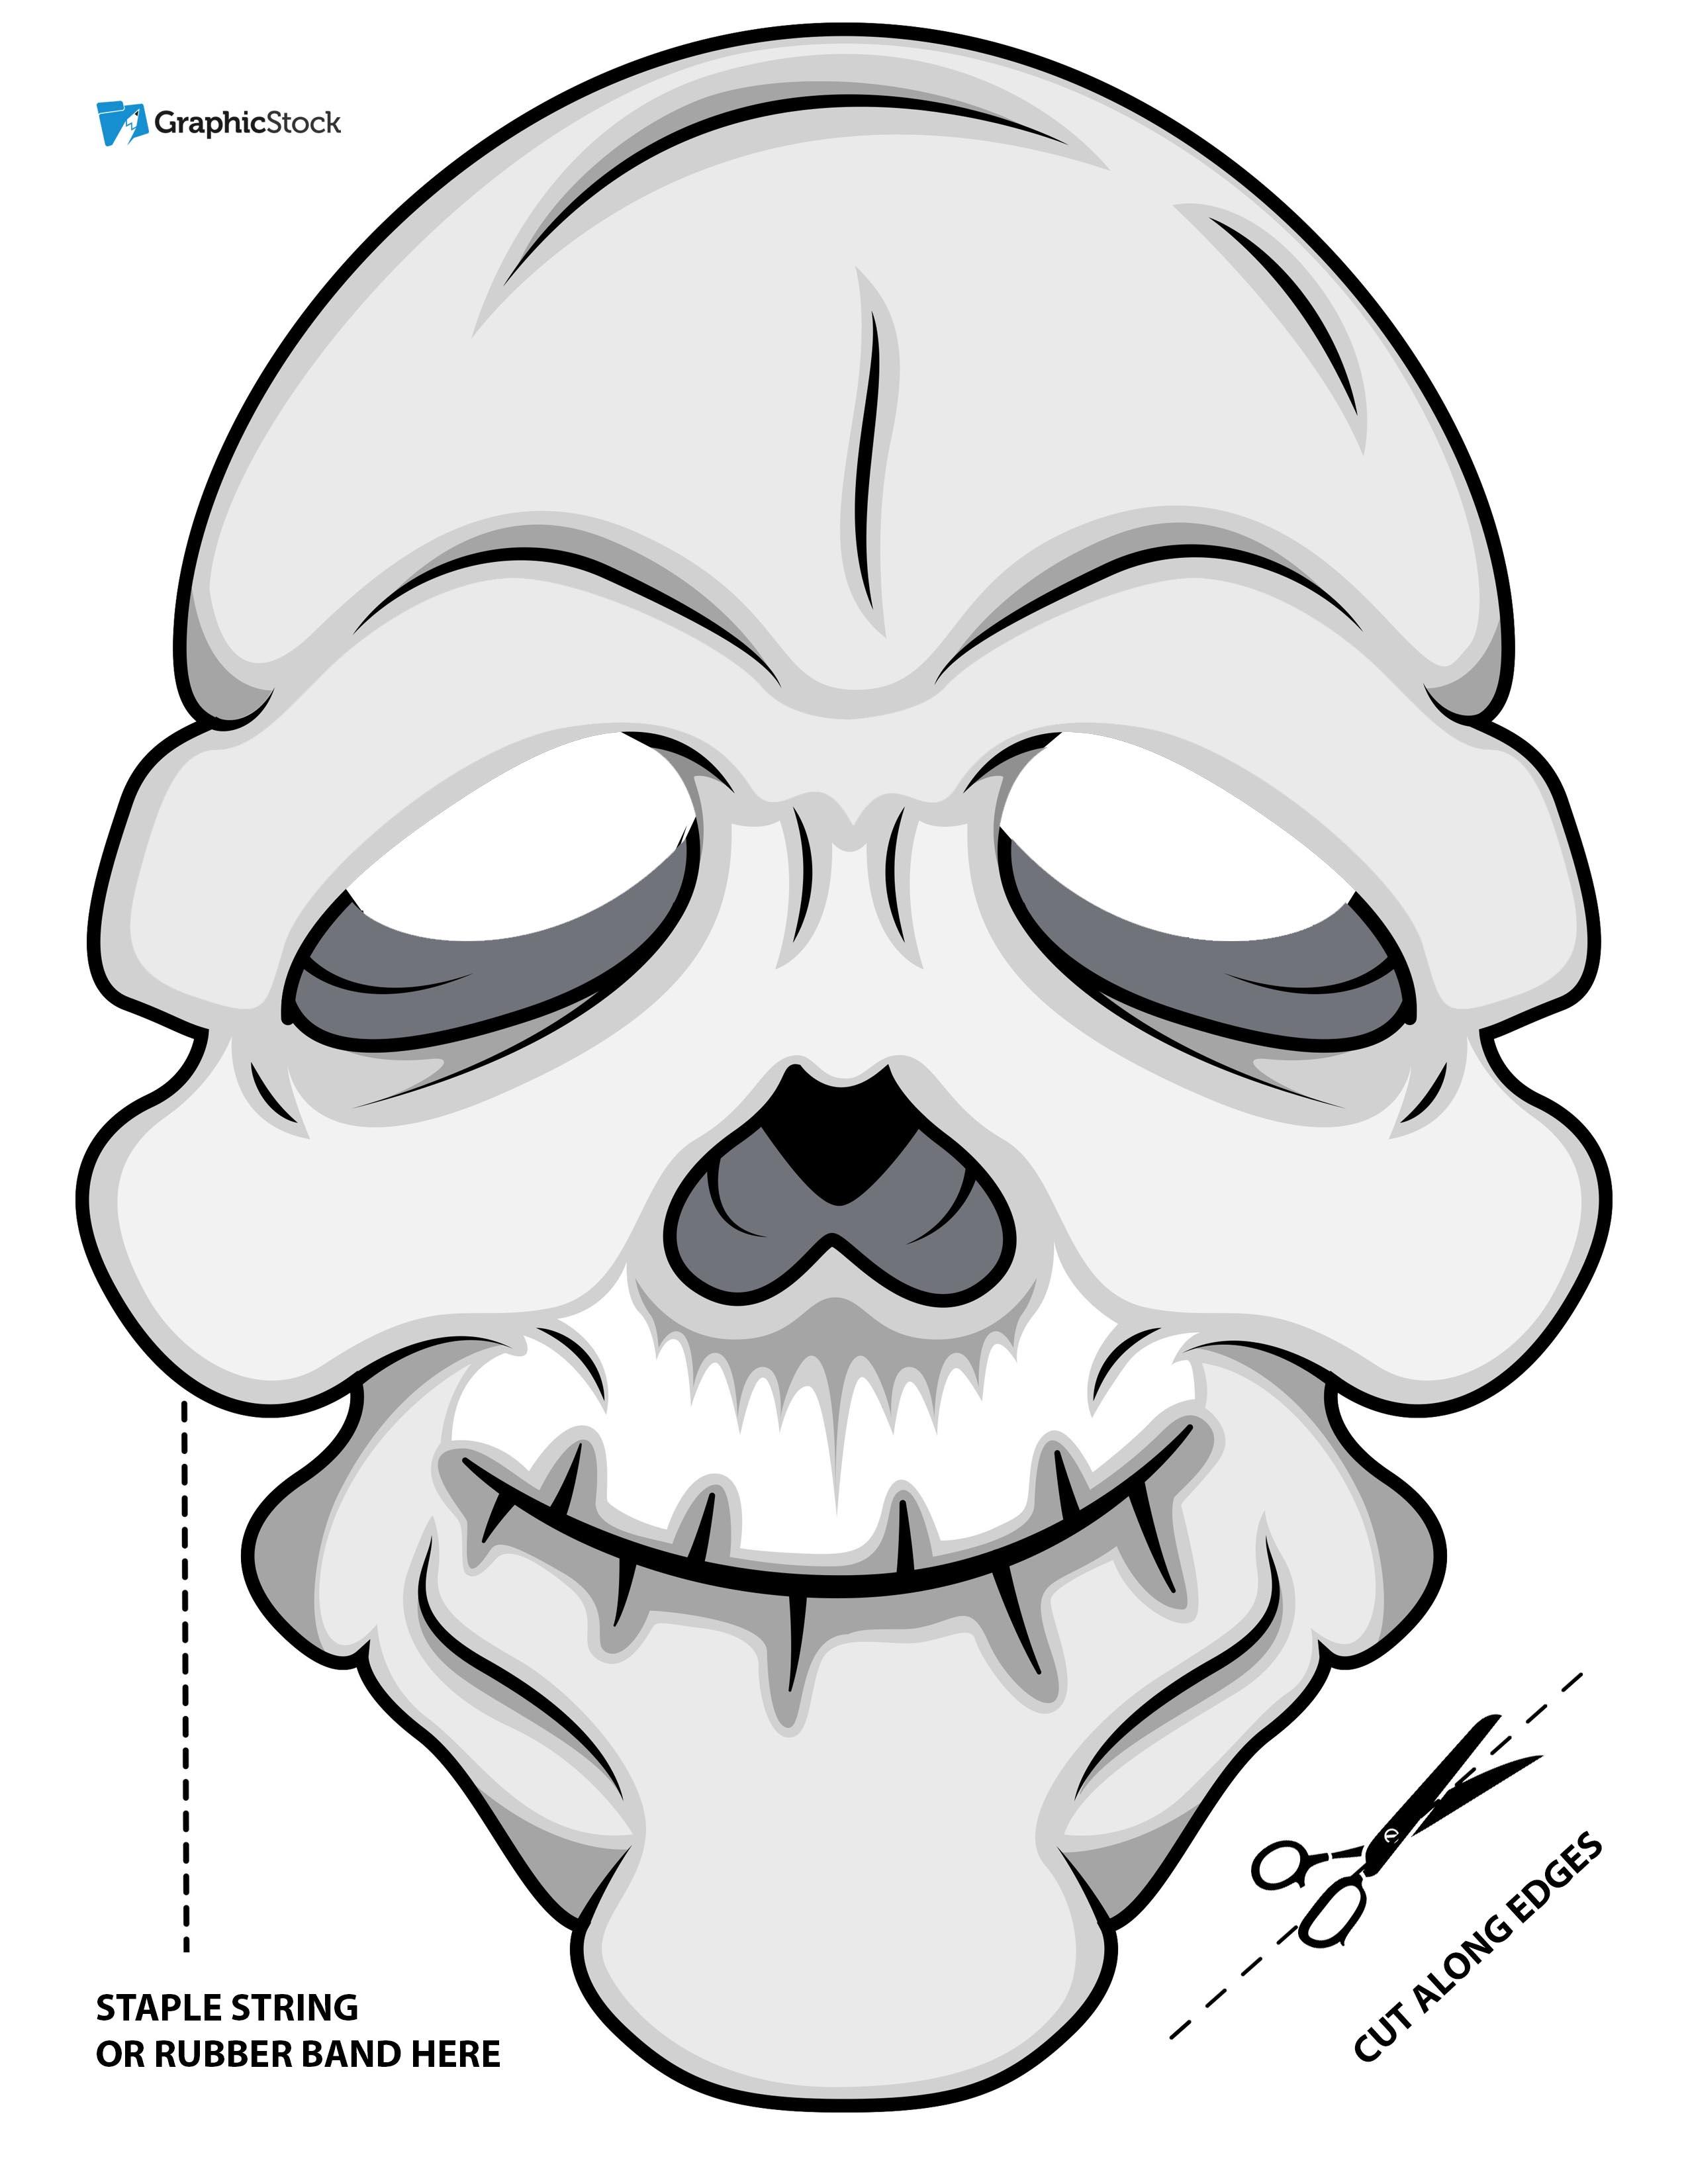 printable halloween masks from stock graphics storyblocks blog